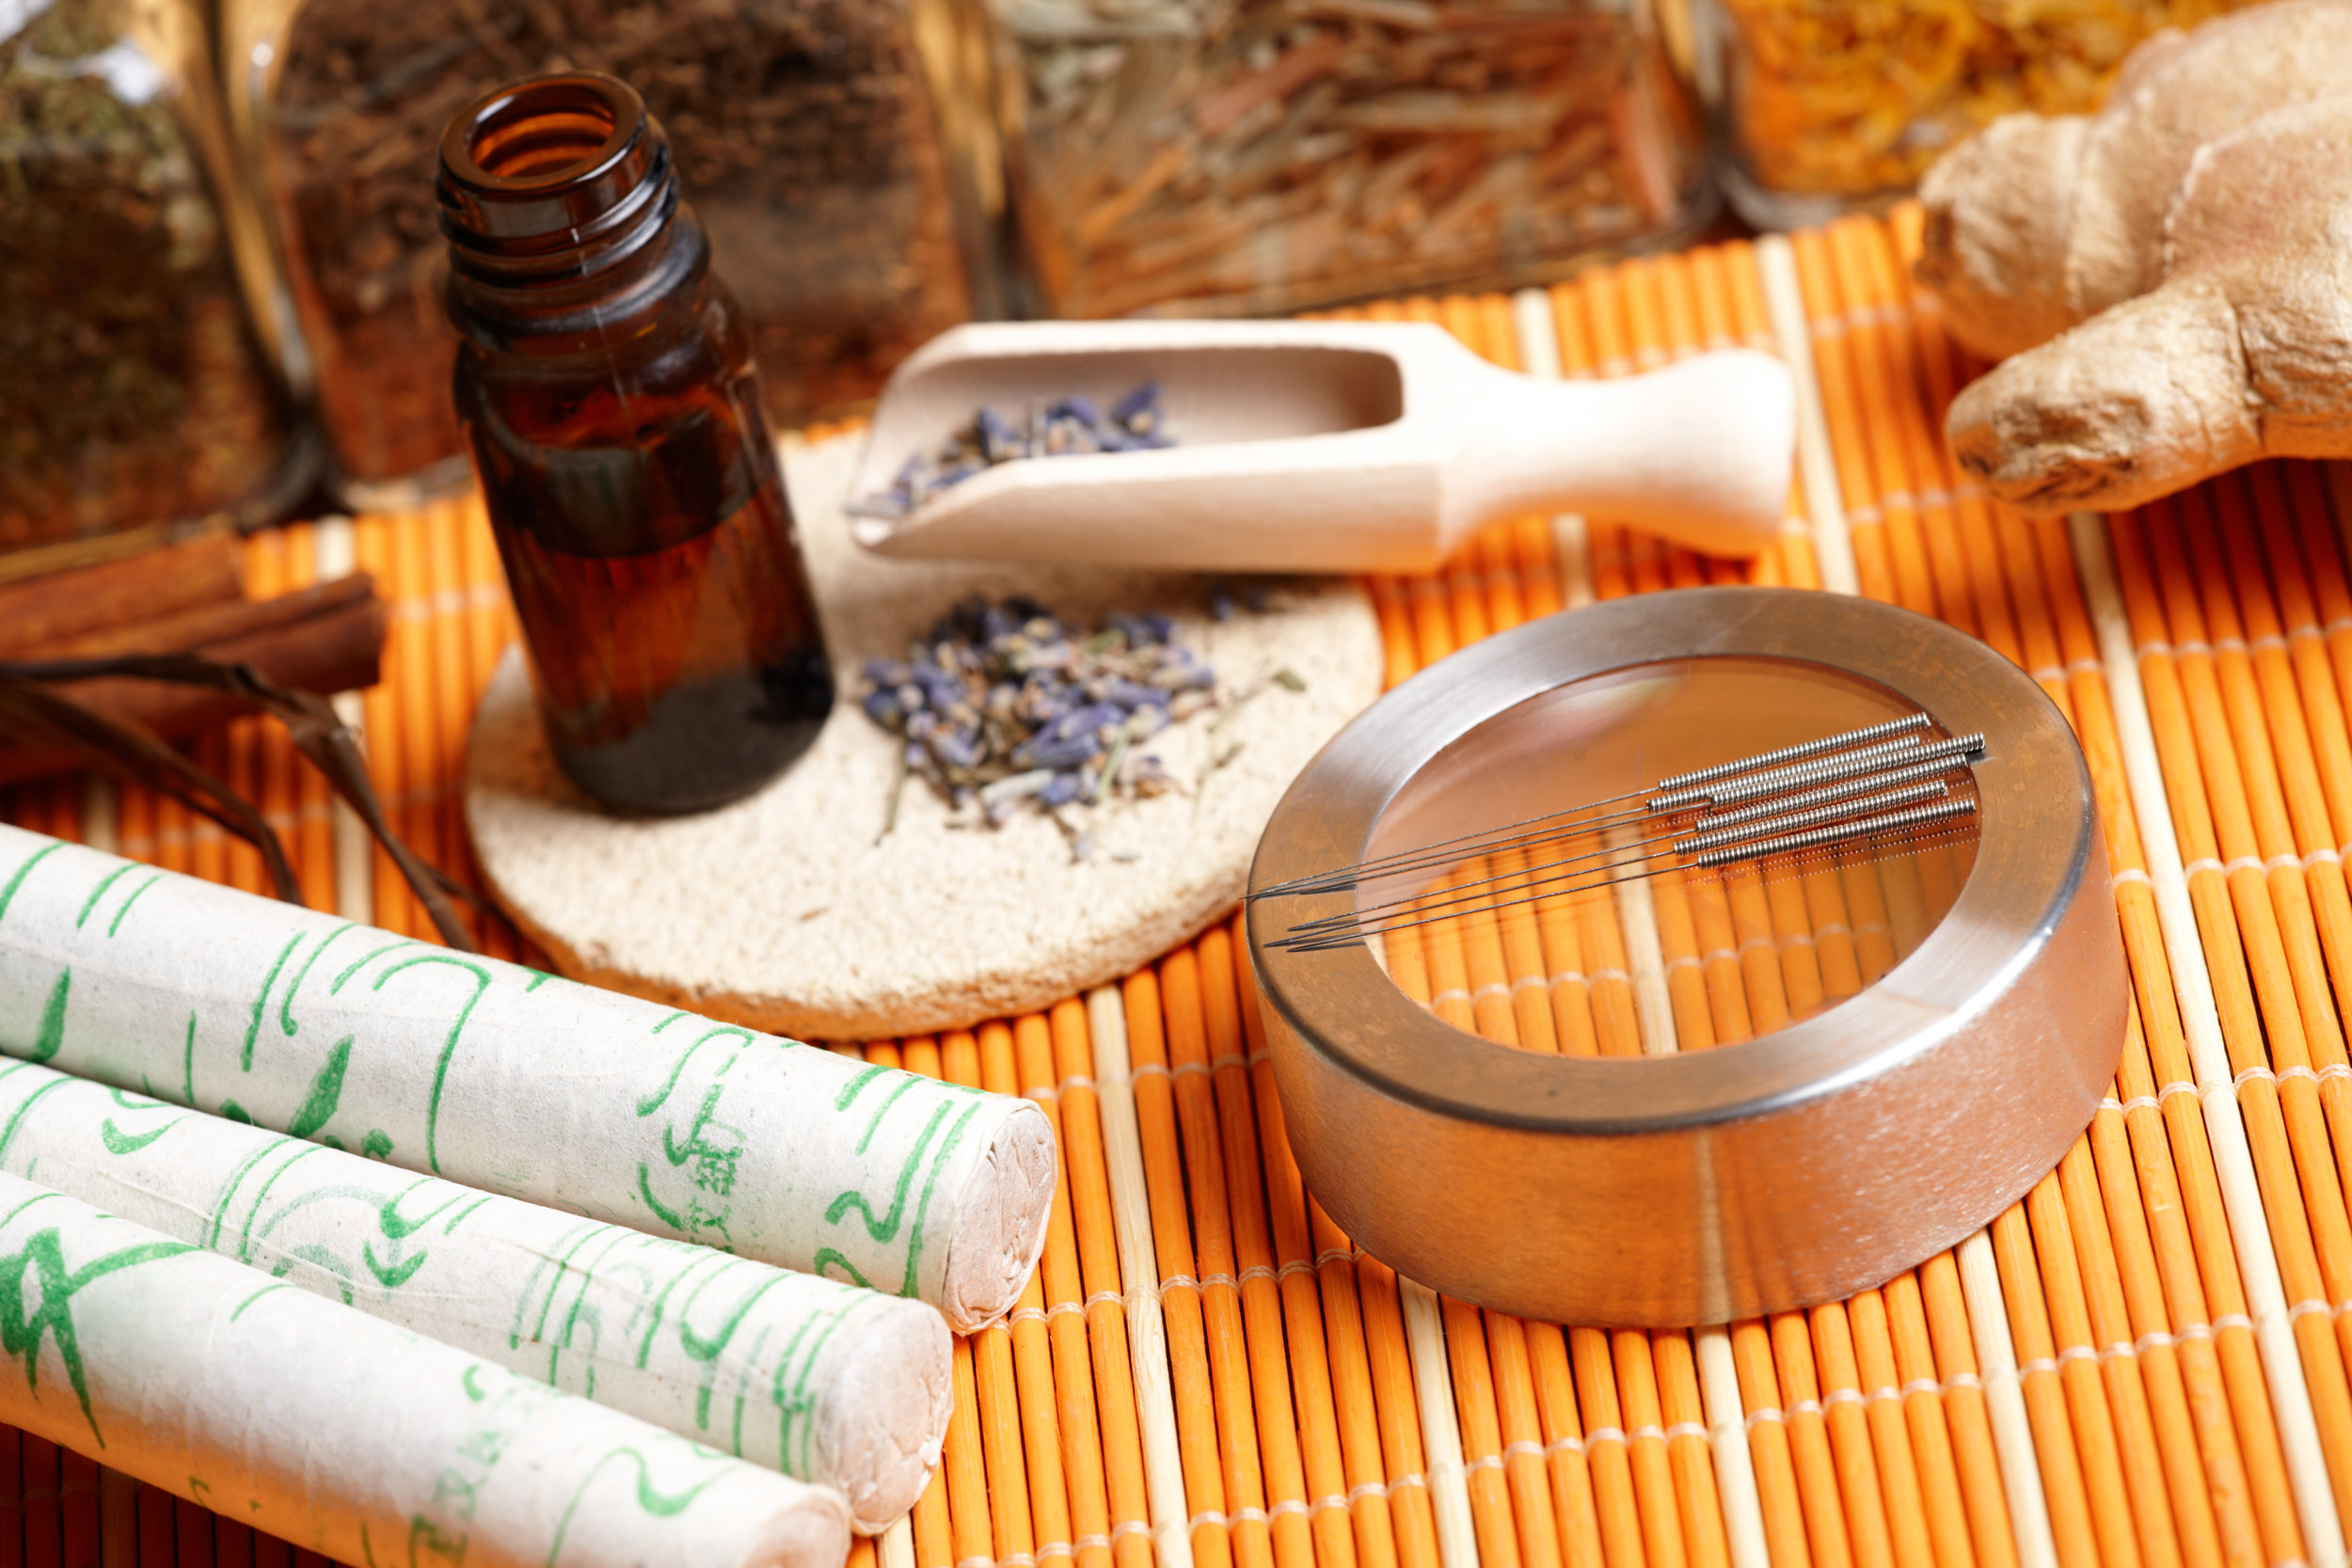 Chinese Medicine Supplies 2.jpeg